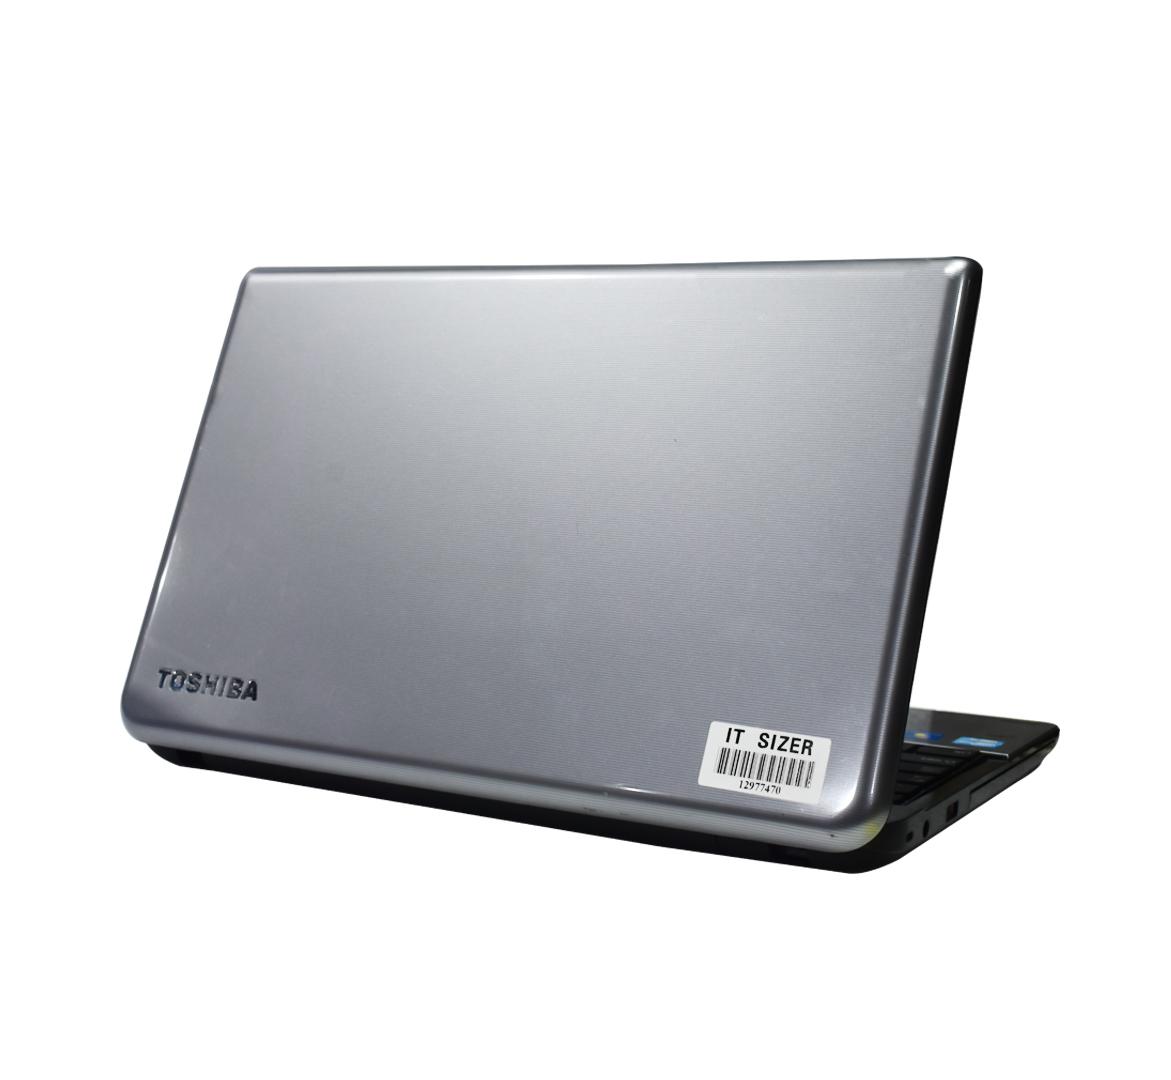 Toshiba Satellite C55-A5195 Business Laptop, Intel Core i3-3110M CPU, 4GB DDR3L SODIMM RAM, 320GB SATA 2.5 Hard, 15 inch Display, (Refurbished)